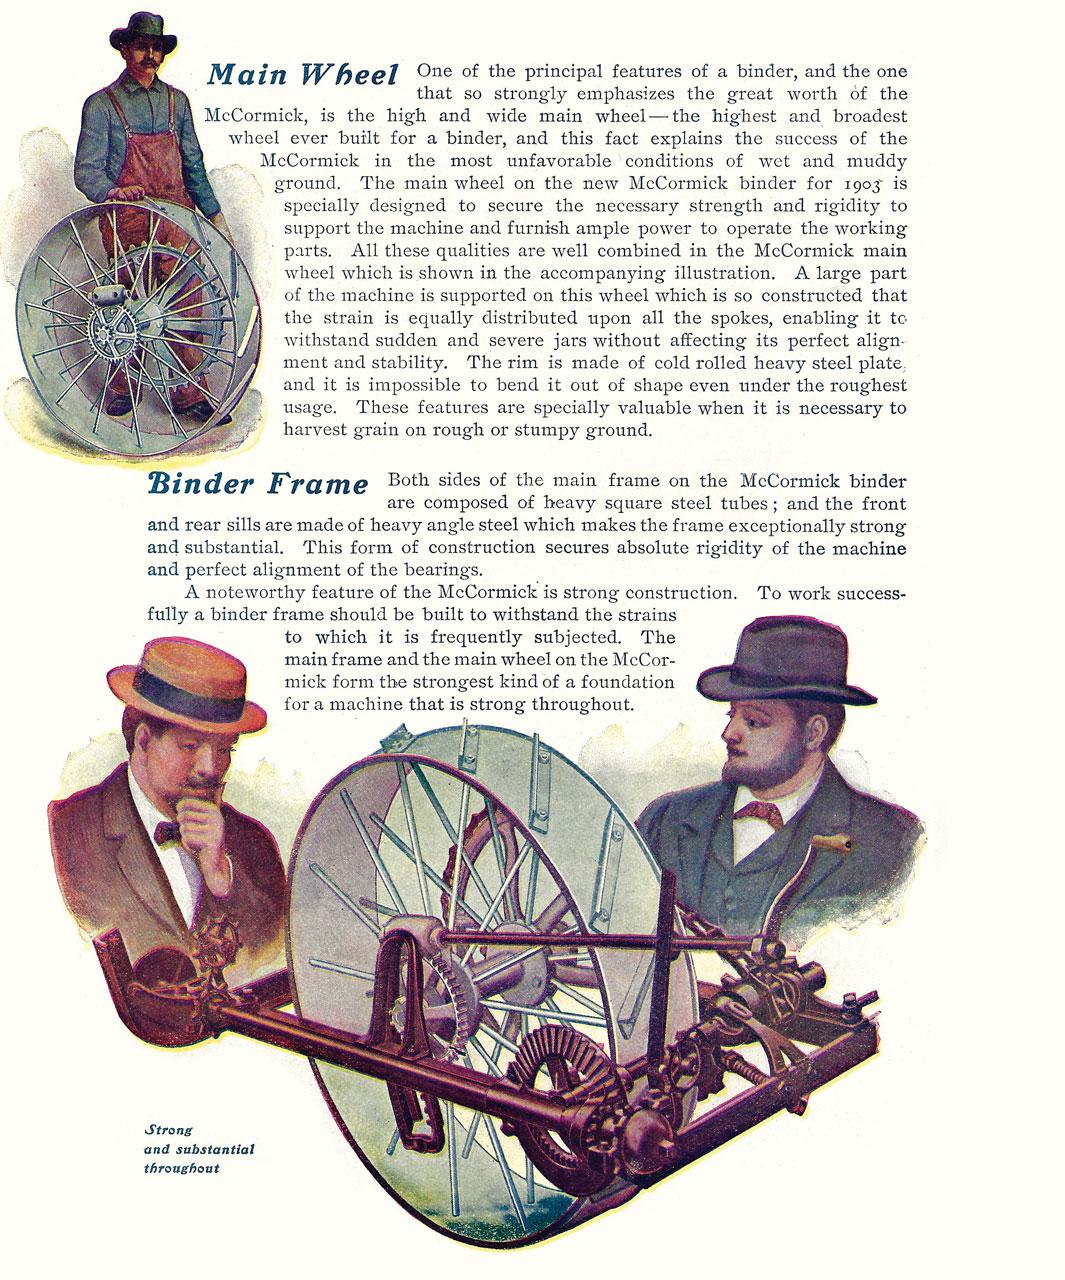 1903 McCormick Binder Brochure